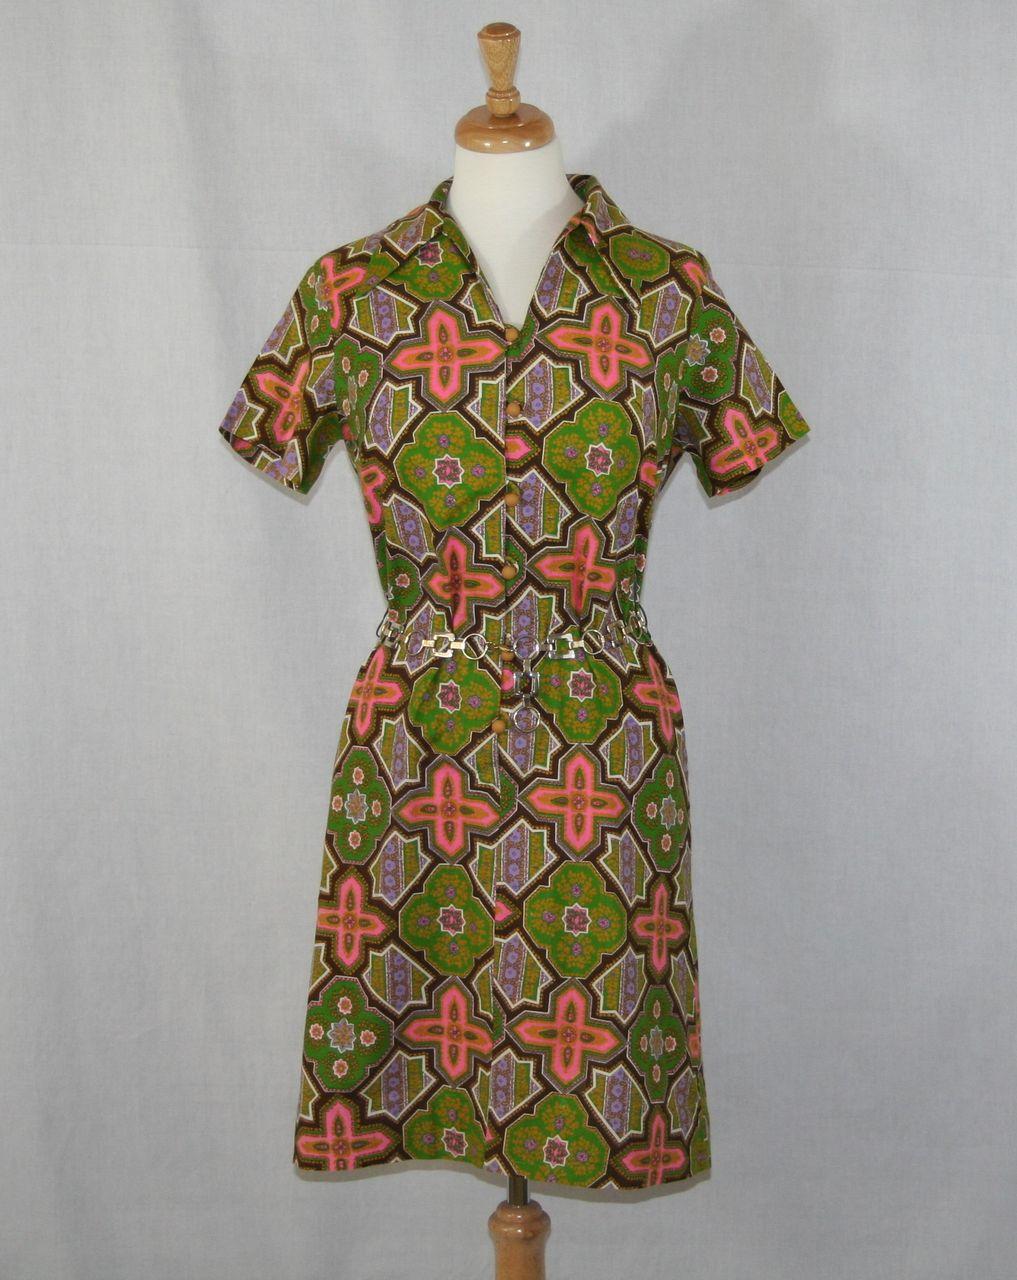 Vintage 1960's Mod Geometric Green and Pink Sheath Dress